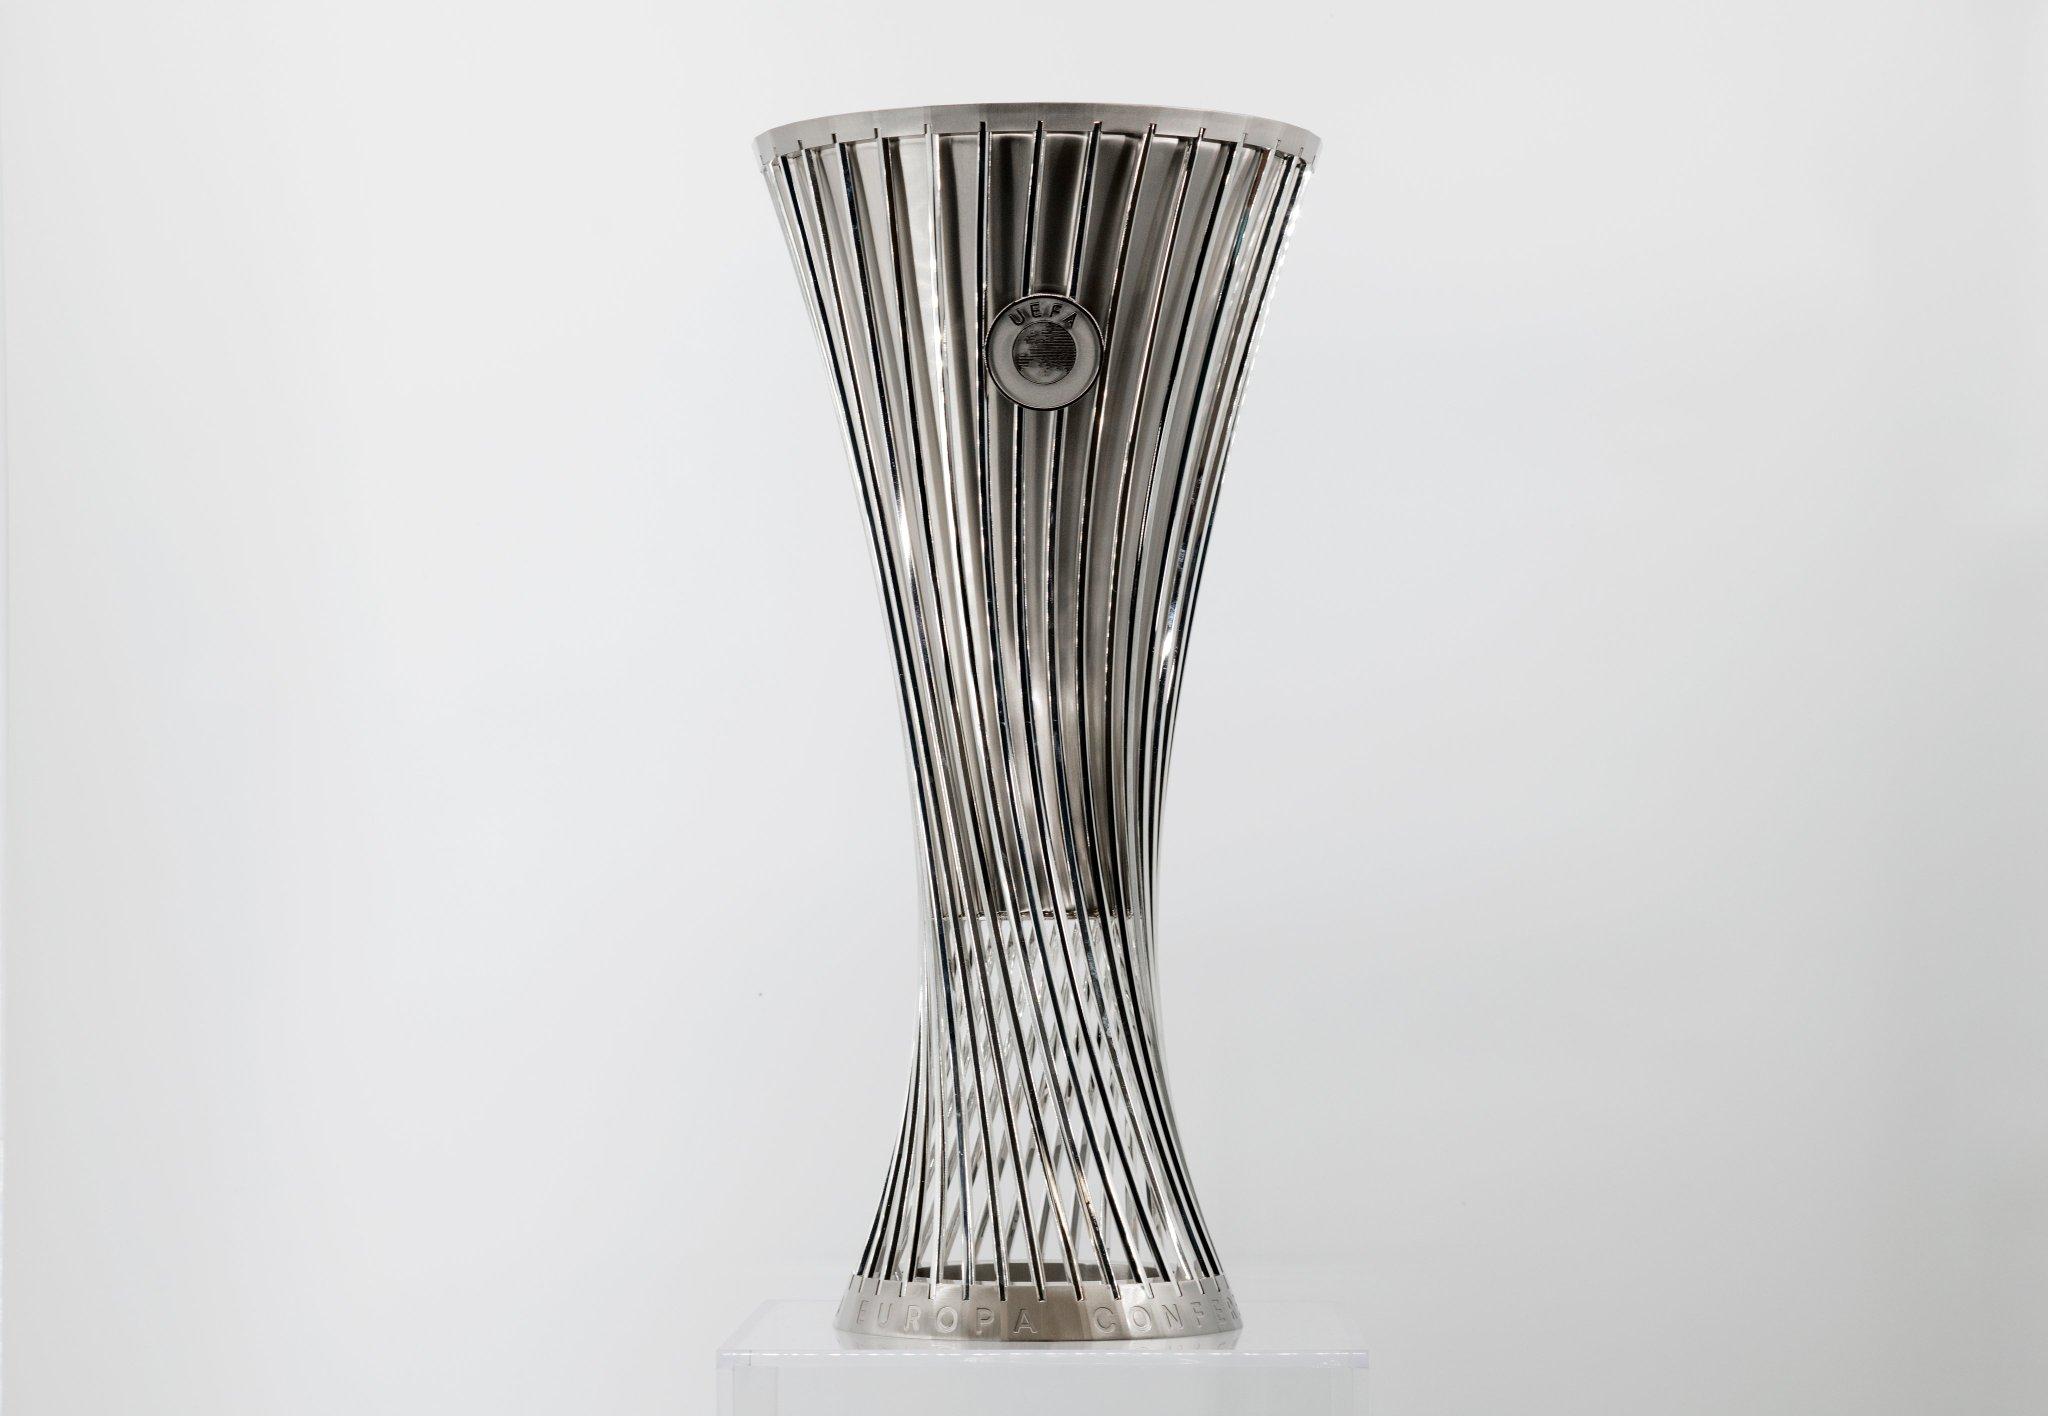 Trofeo conference